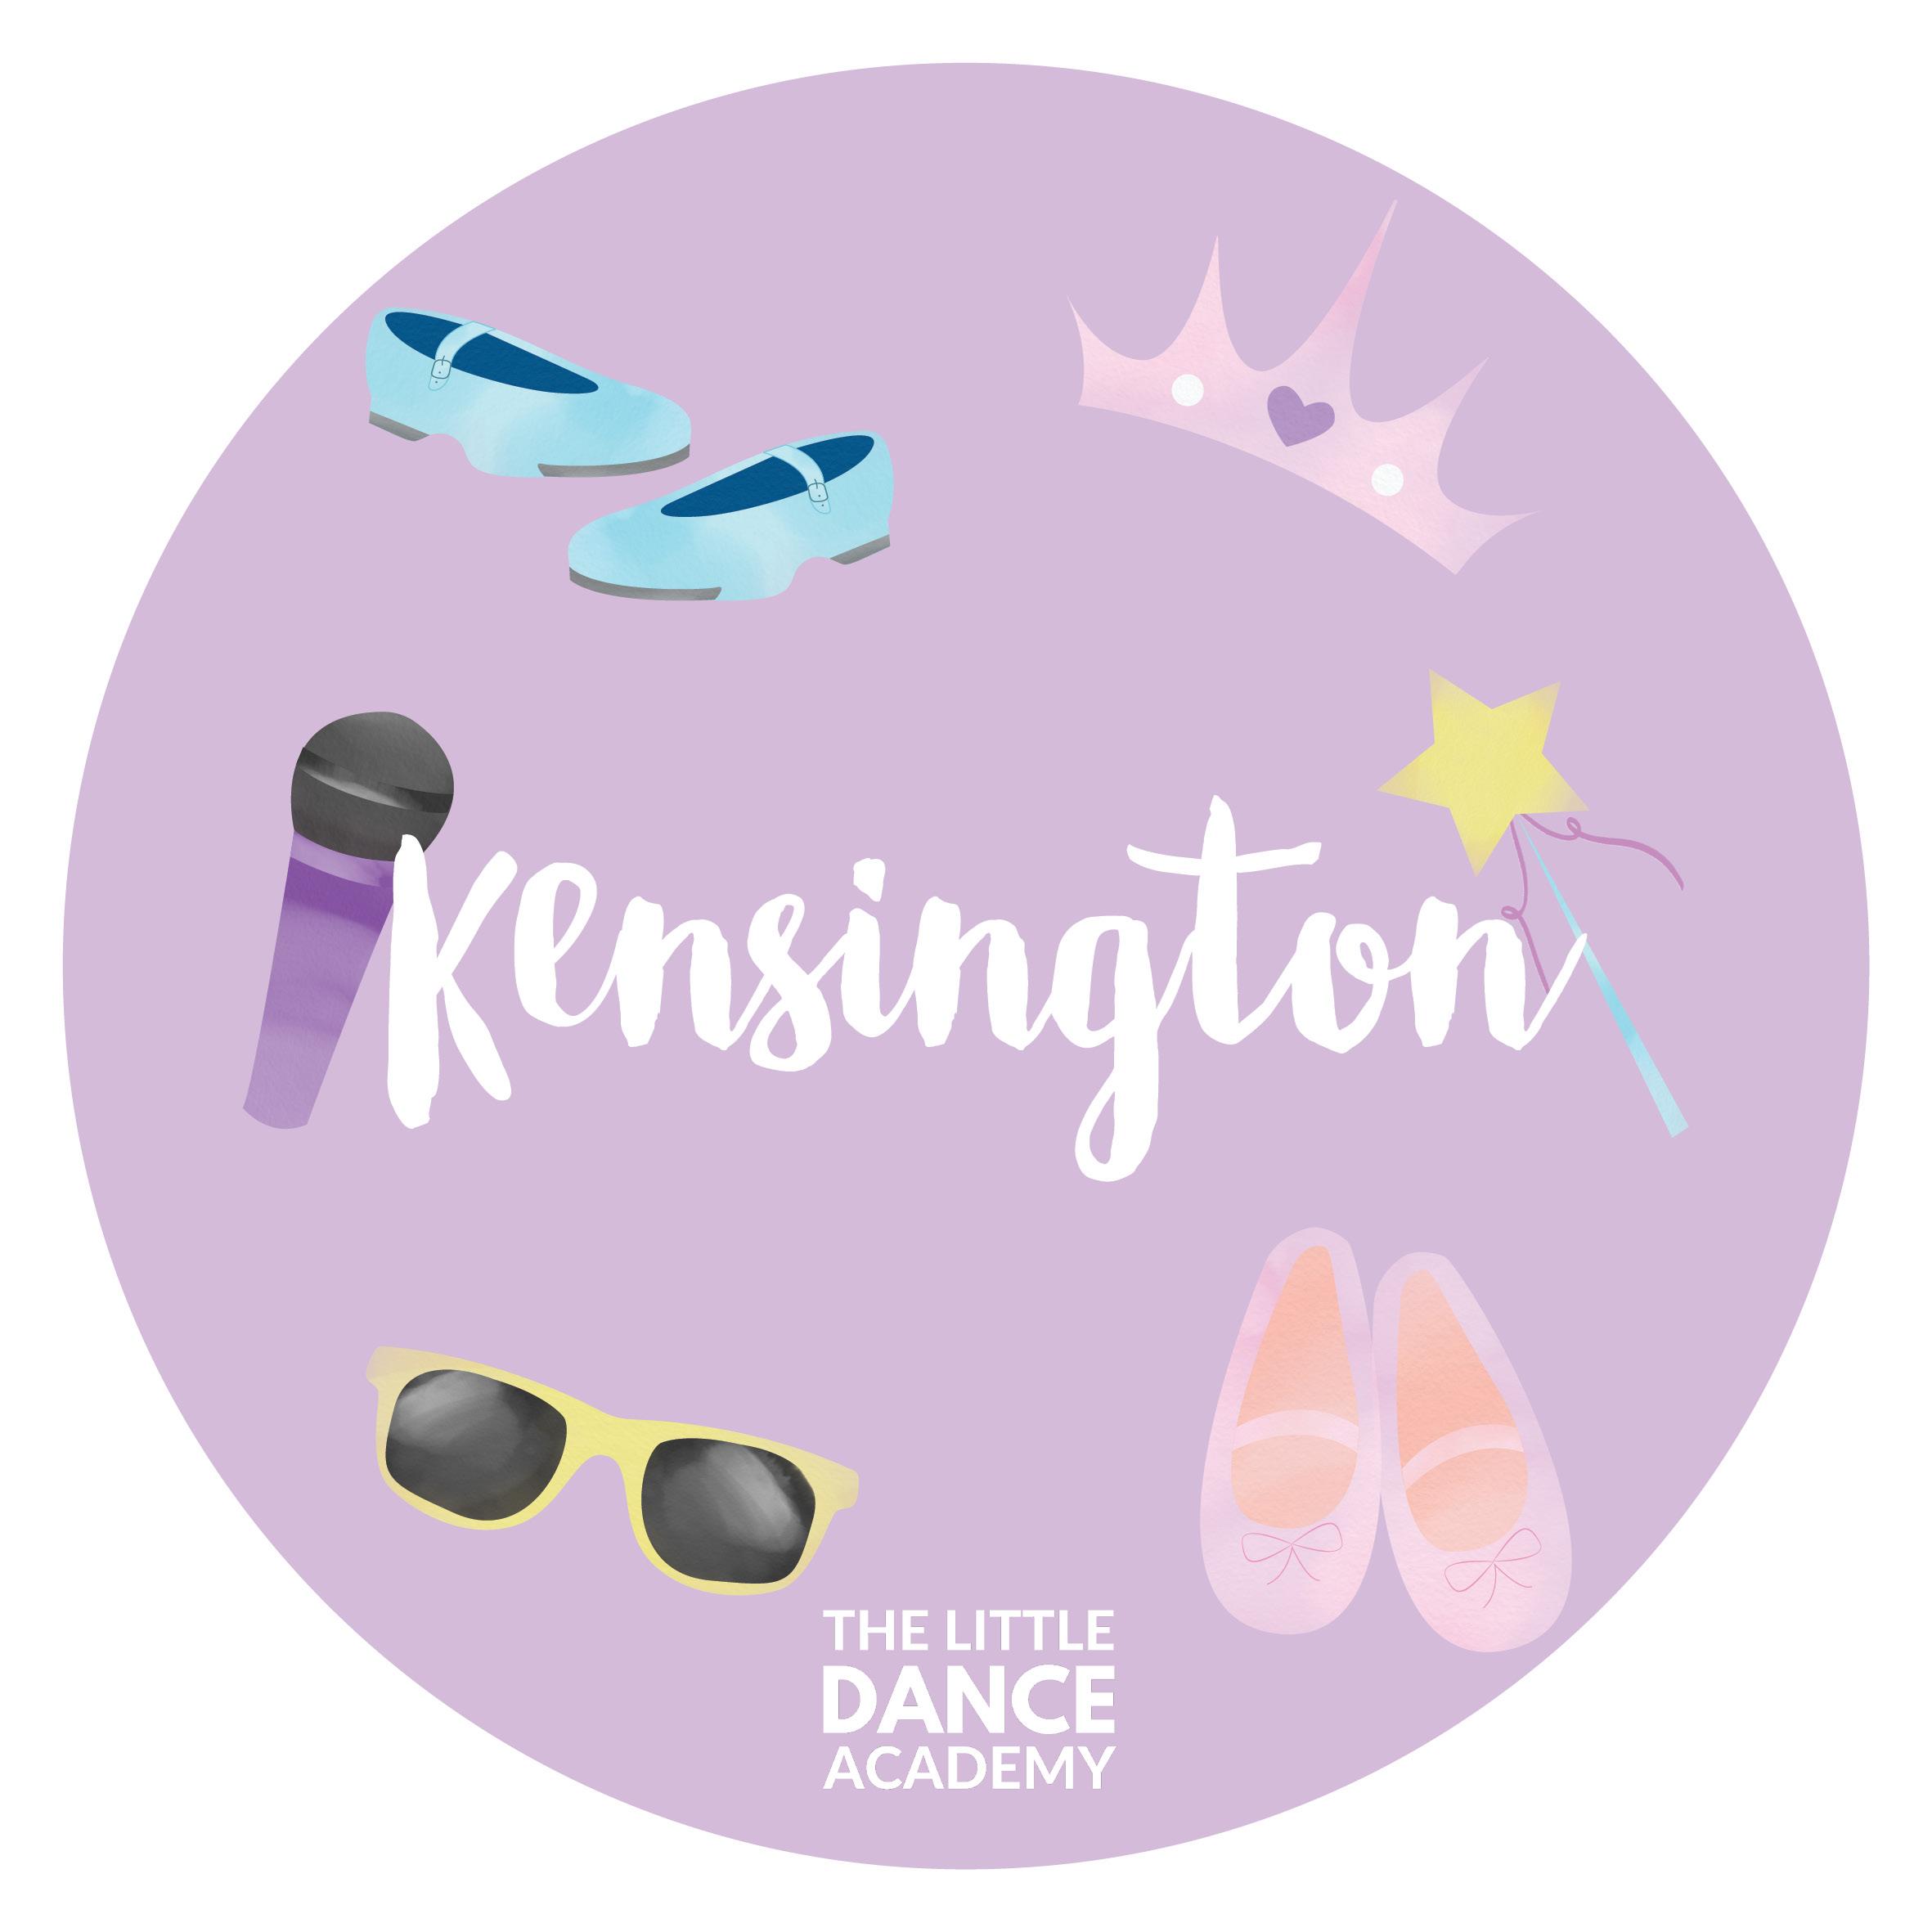 Kensington Children's birthday